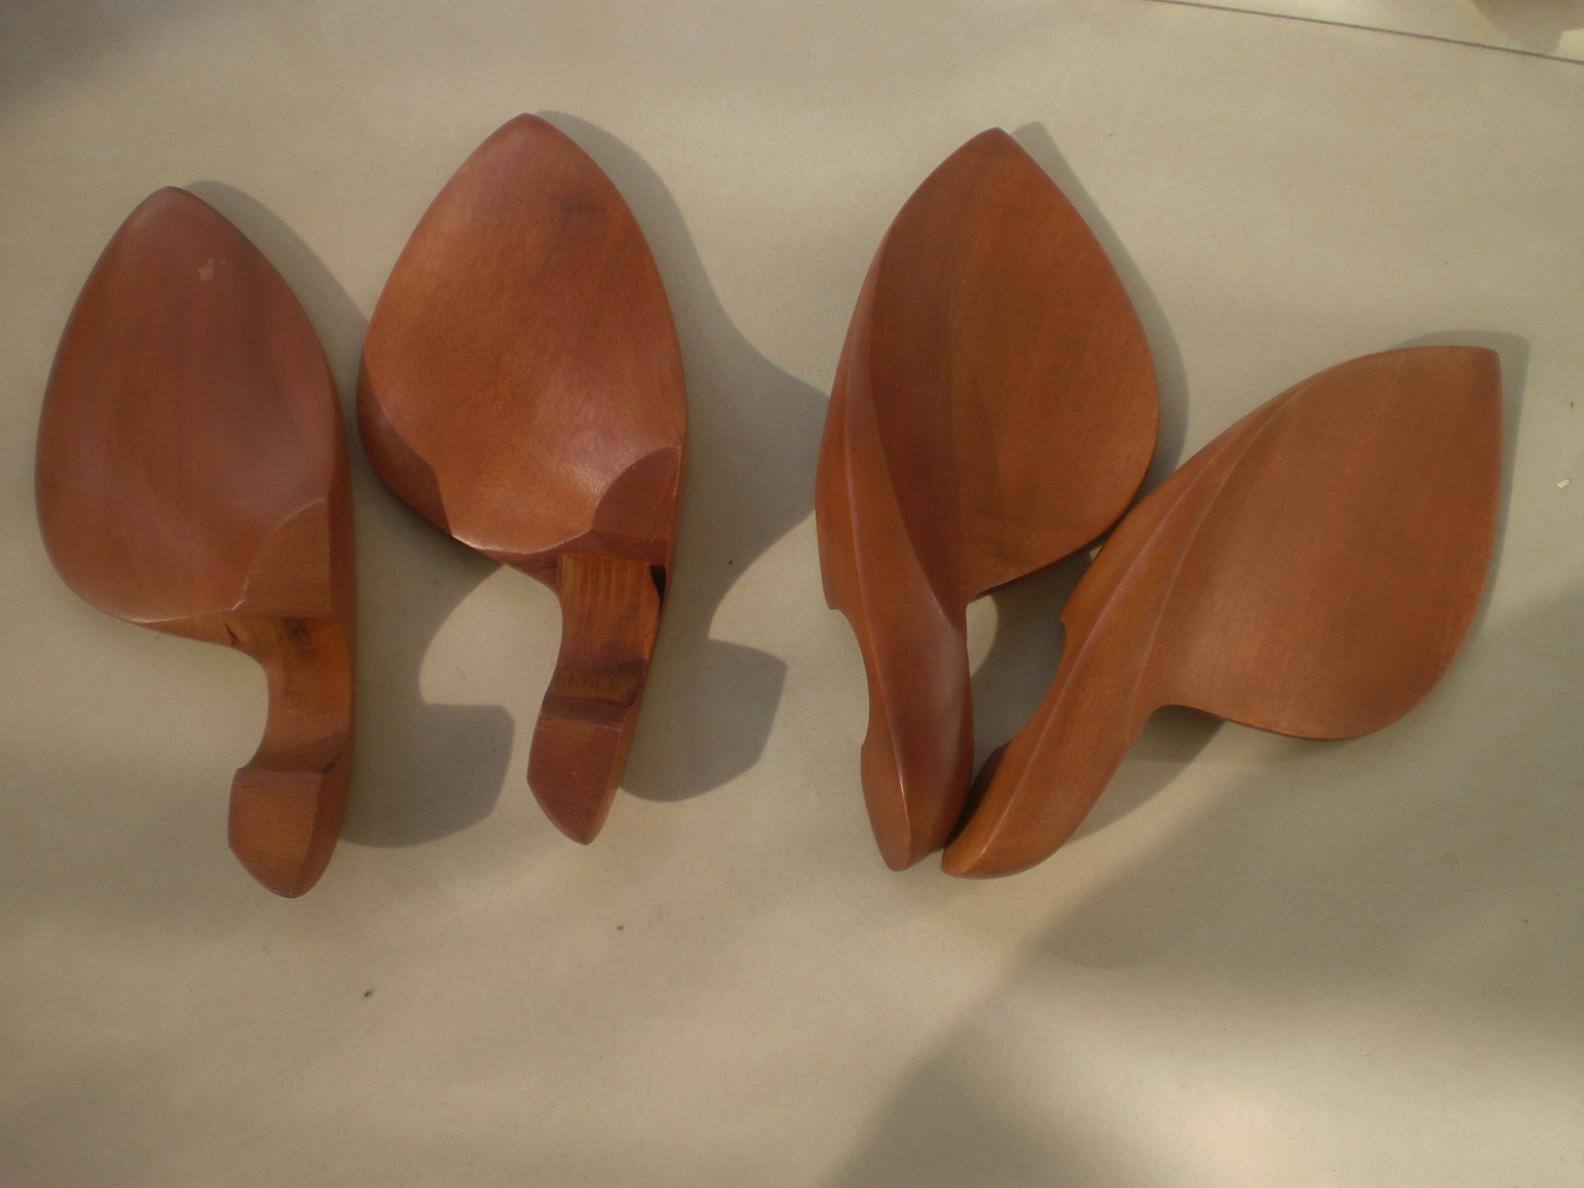 4 Stück Violine Jujube Kinnhalter 4/4 ohne Klemme